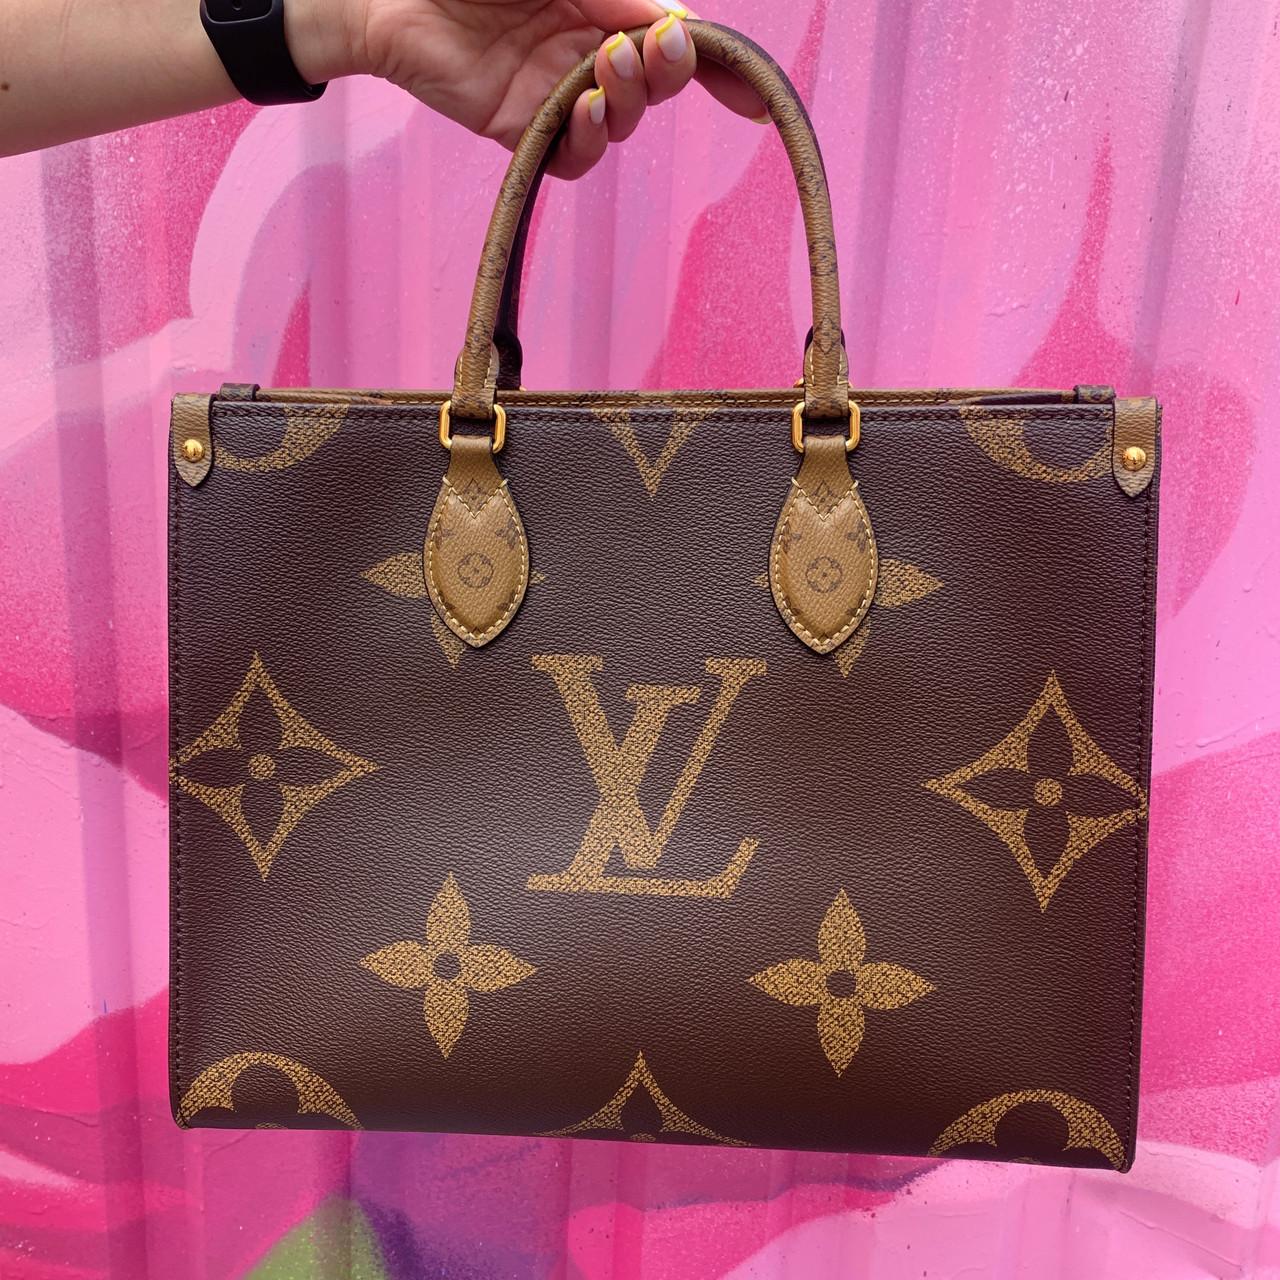 Cумка Louis Vuitton Onthego (Луи Витон Онзего) арт. 03-489